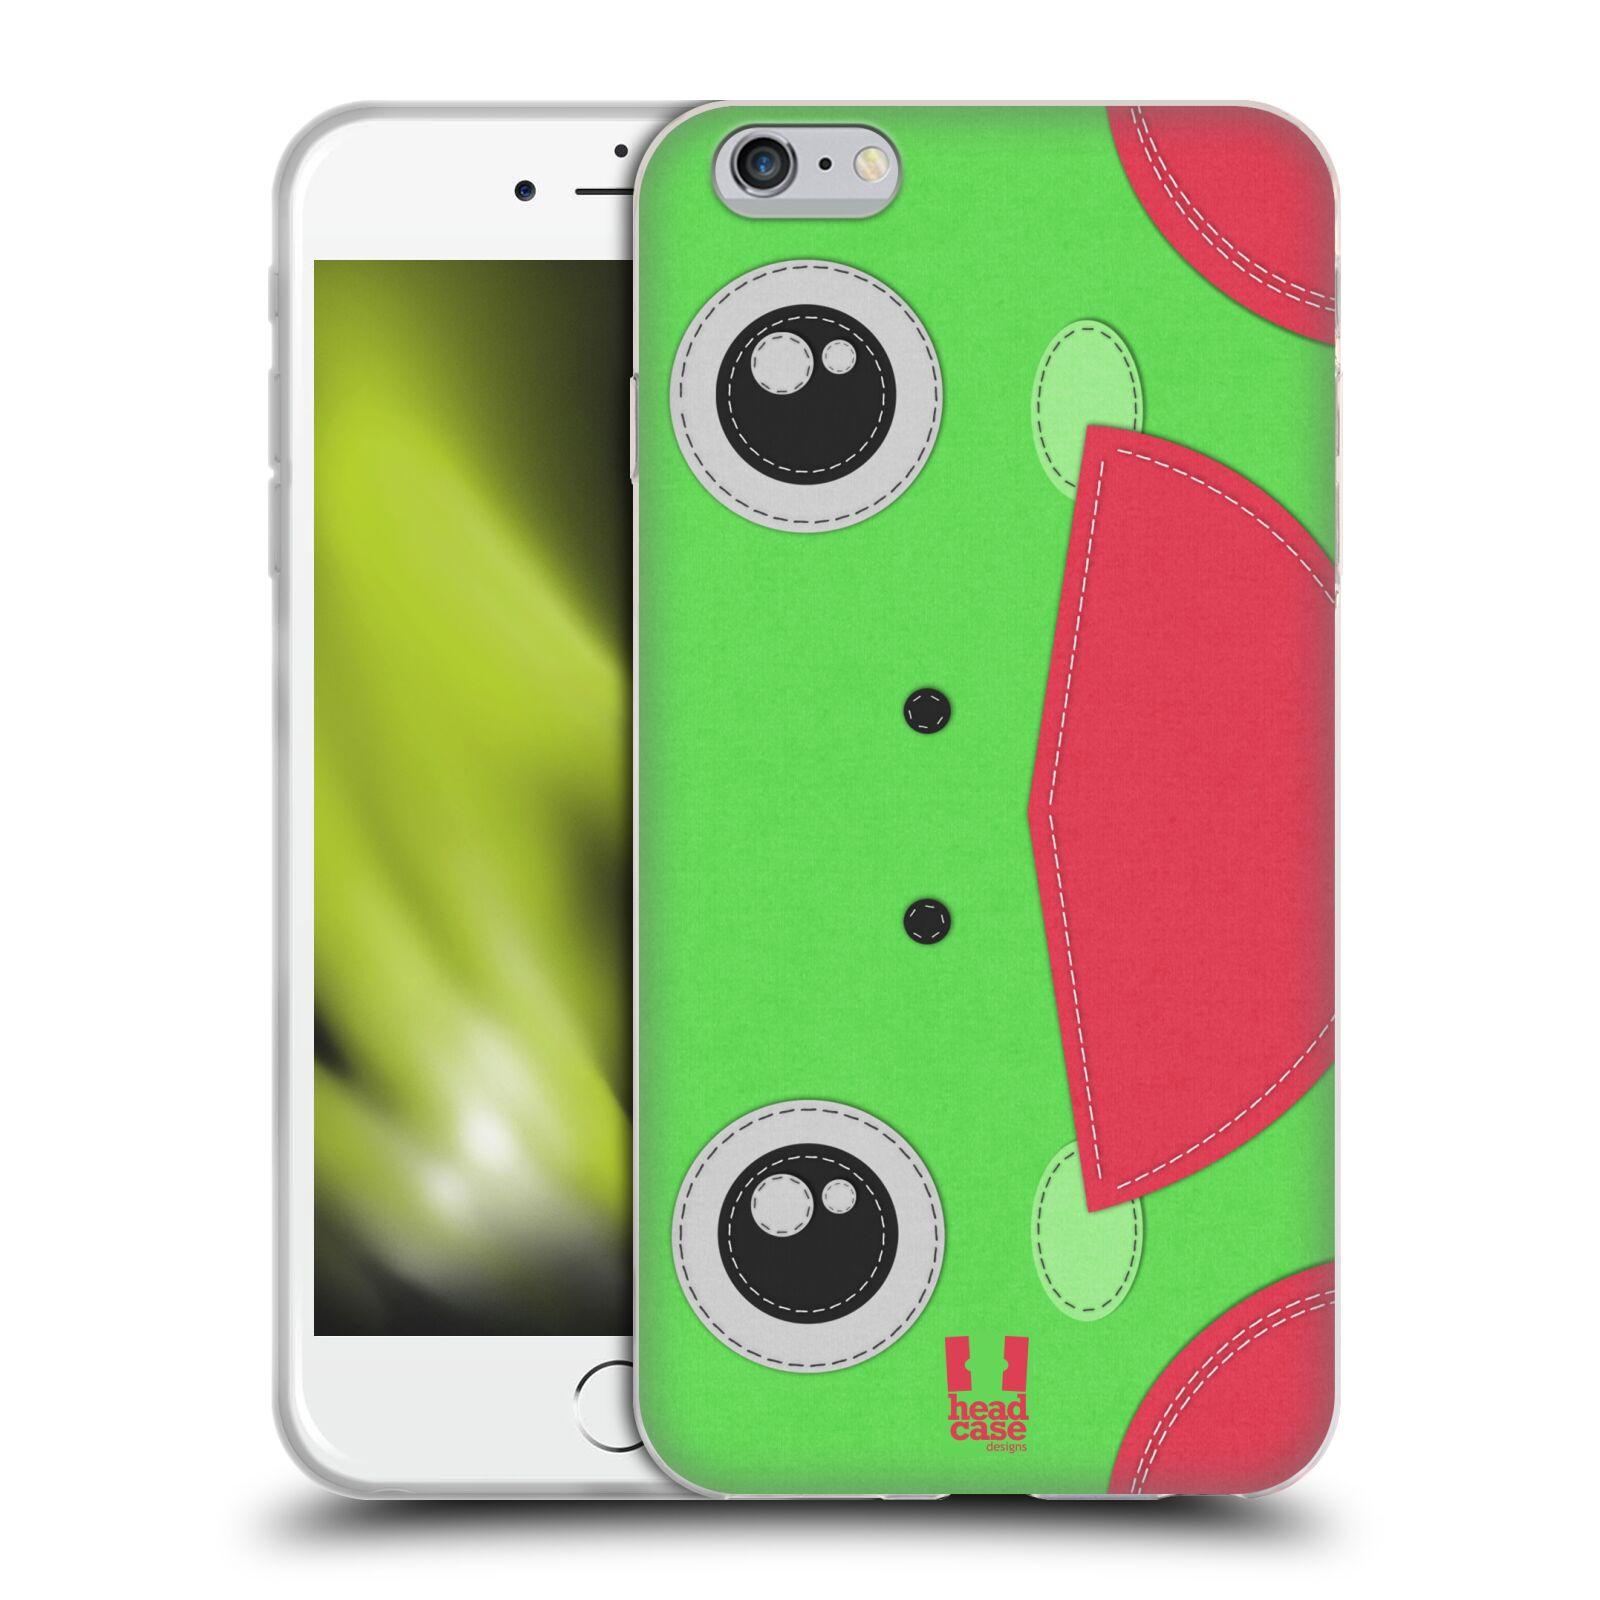 HEAD CASE silikonový obal na mobil Apple Iphone 6 PLUS/ 6S PLUS vzor zvířecí nášivka žába